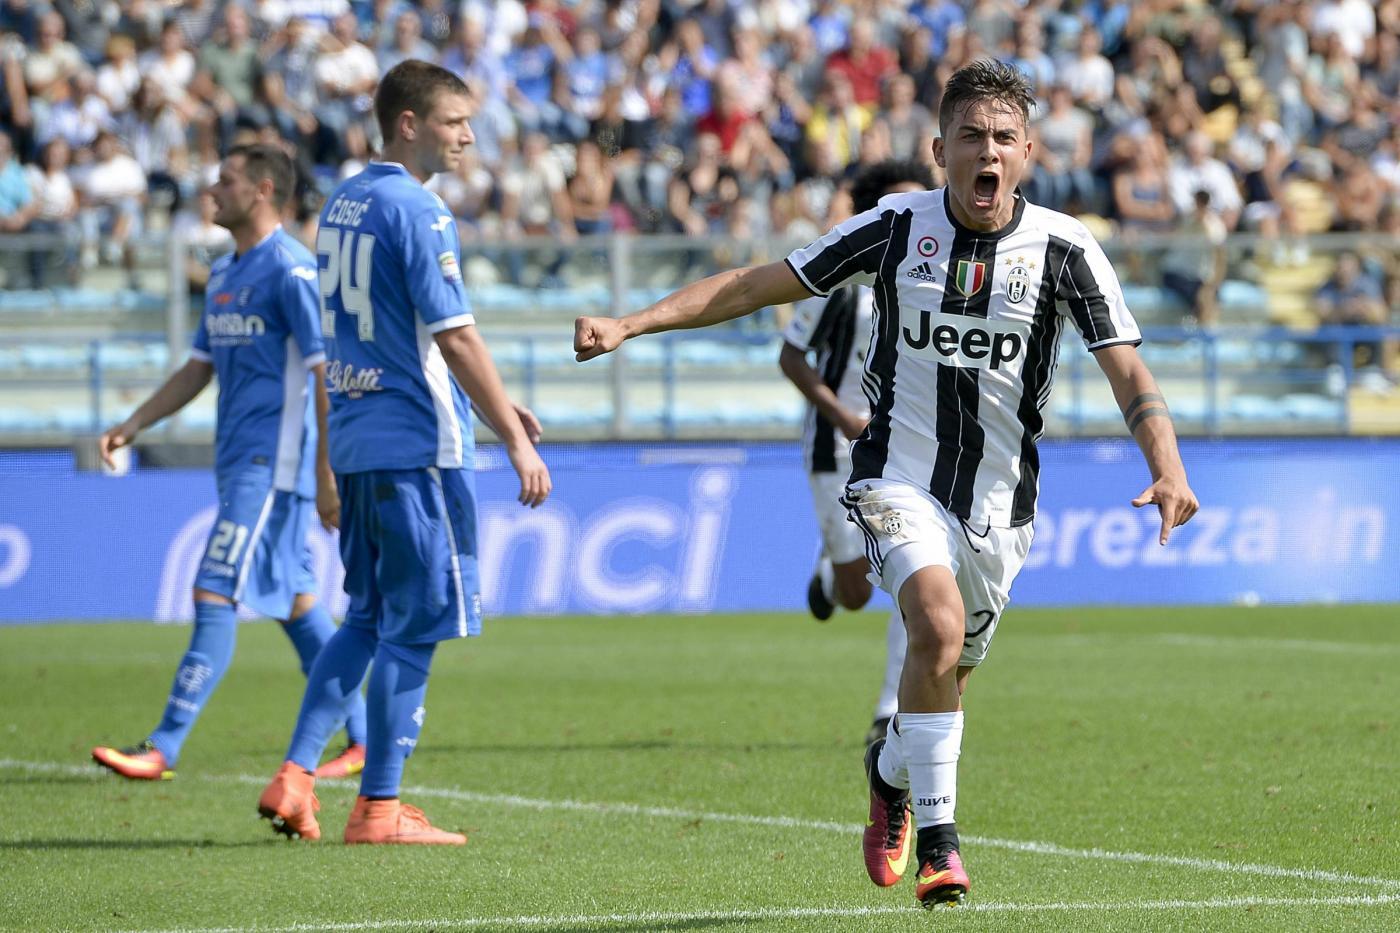 Partita Empoli vs Juventus in diretta, Serie A 2016 Live (12.30)